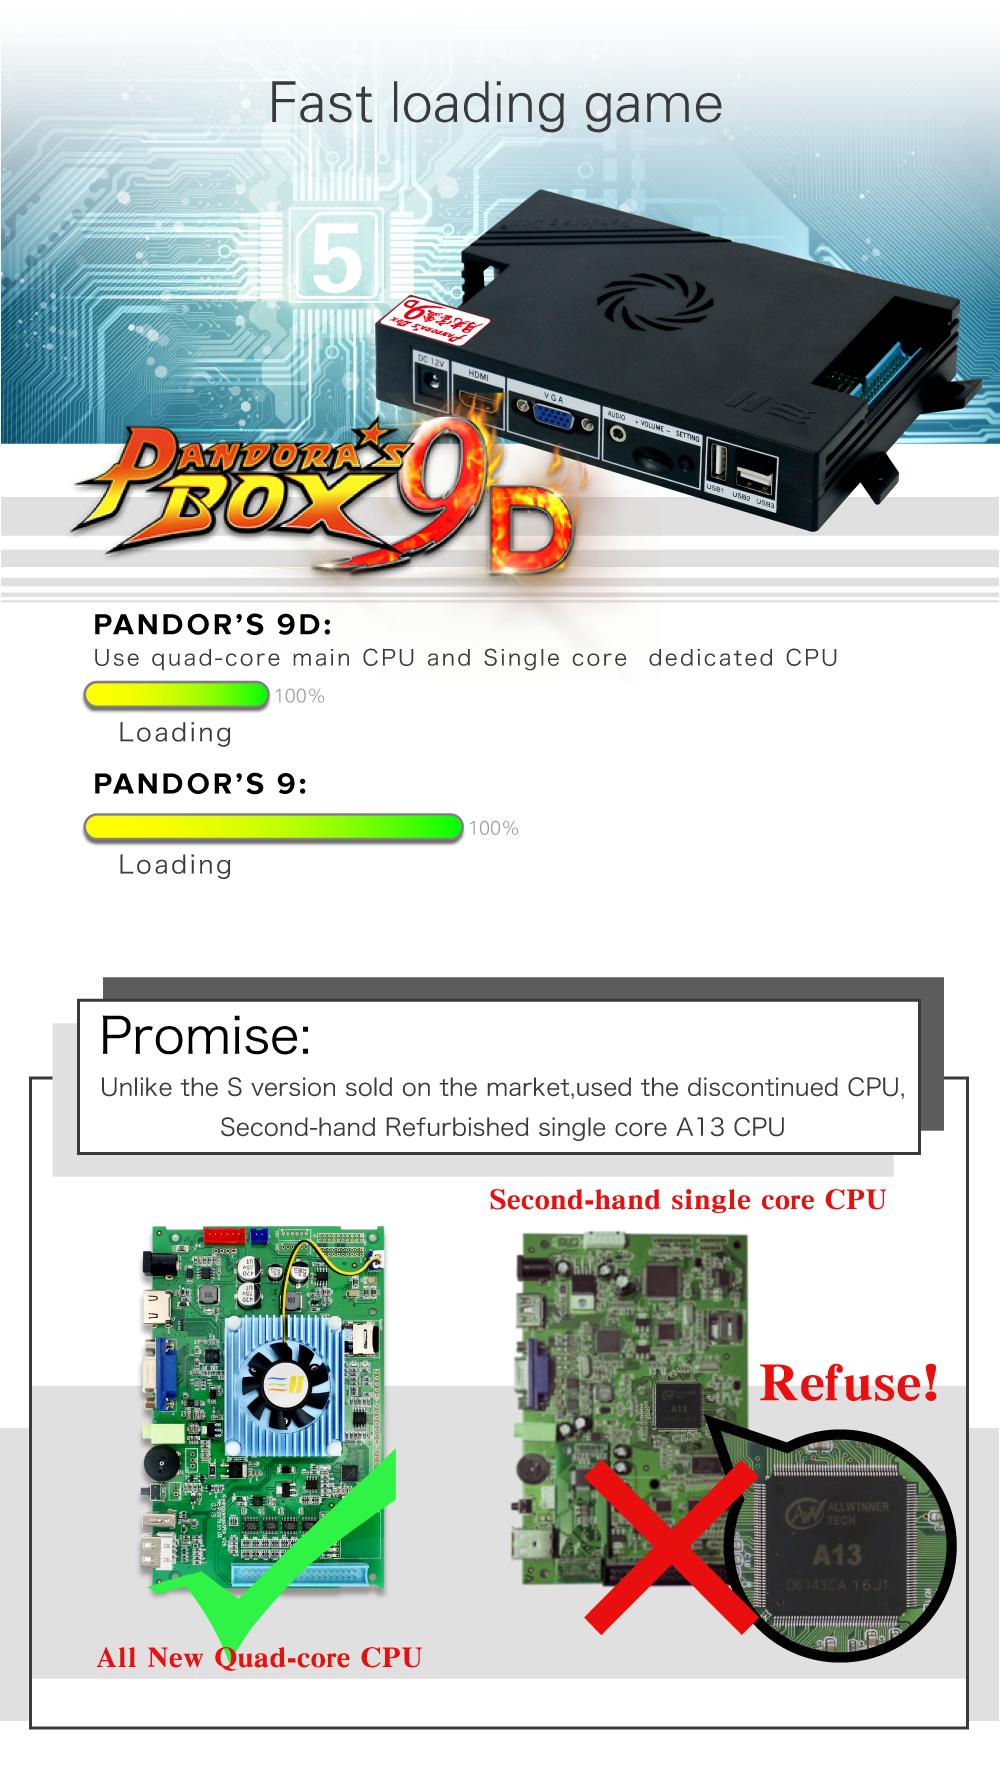 BLEE-Custom Pandora Box Arcade Manufacturer, Pandora Box Game Console | Pandora-9